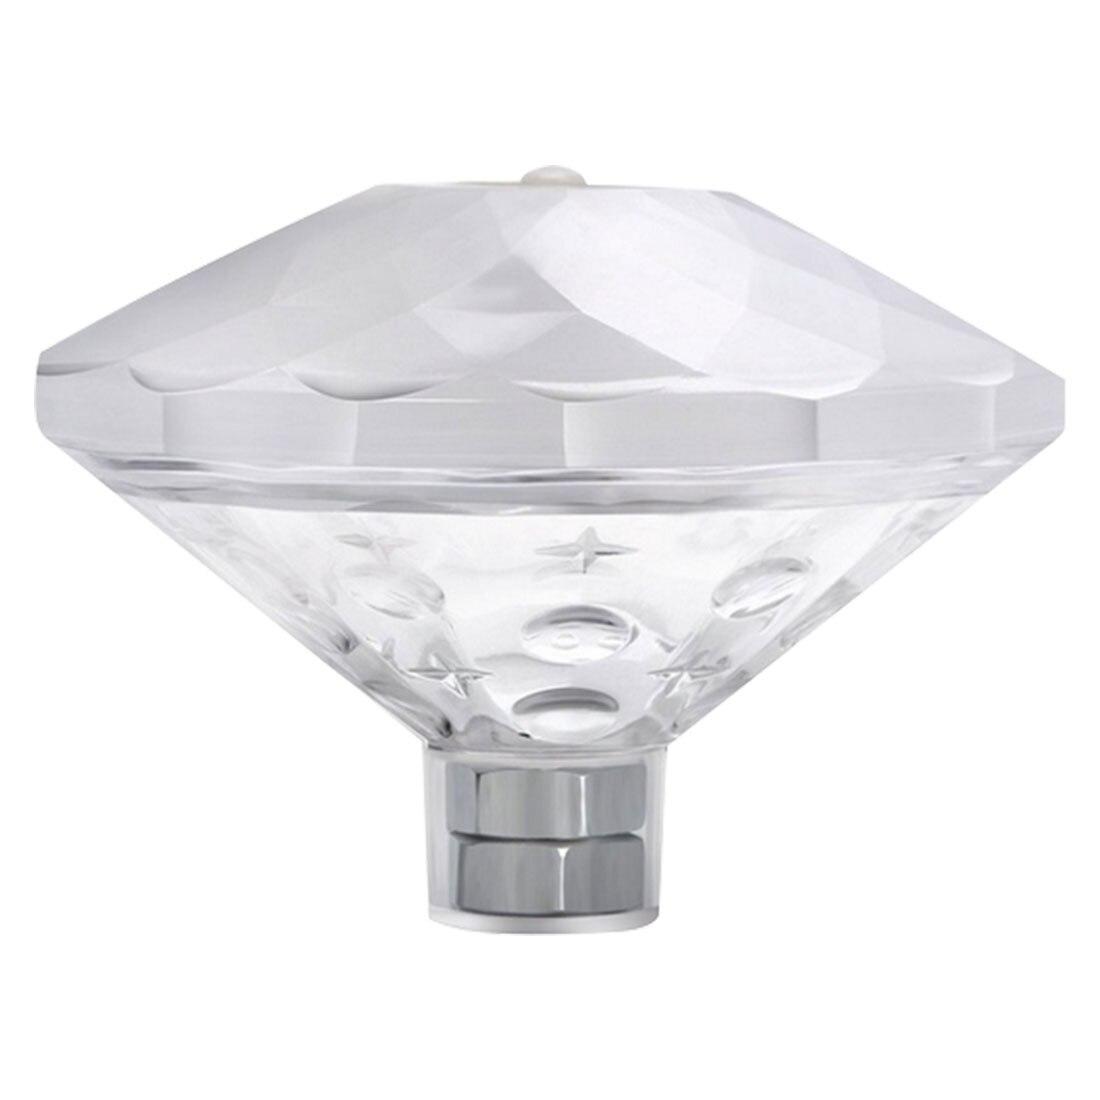 Lâmpada de led para piscina, luz flutuante